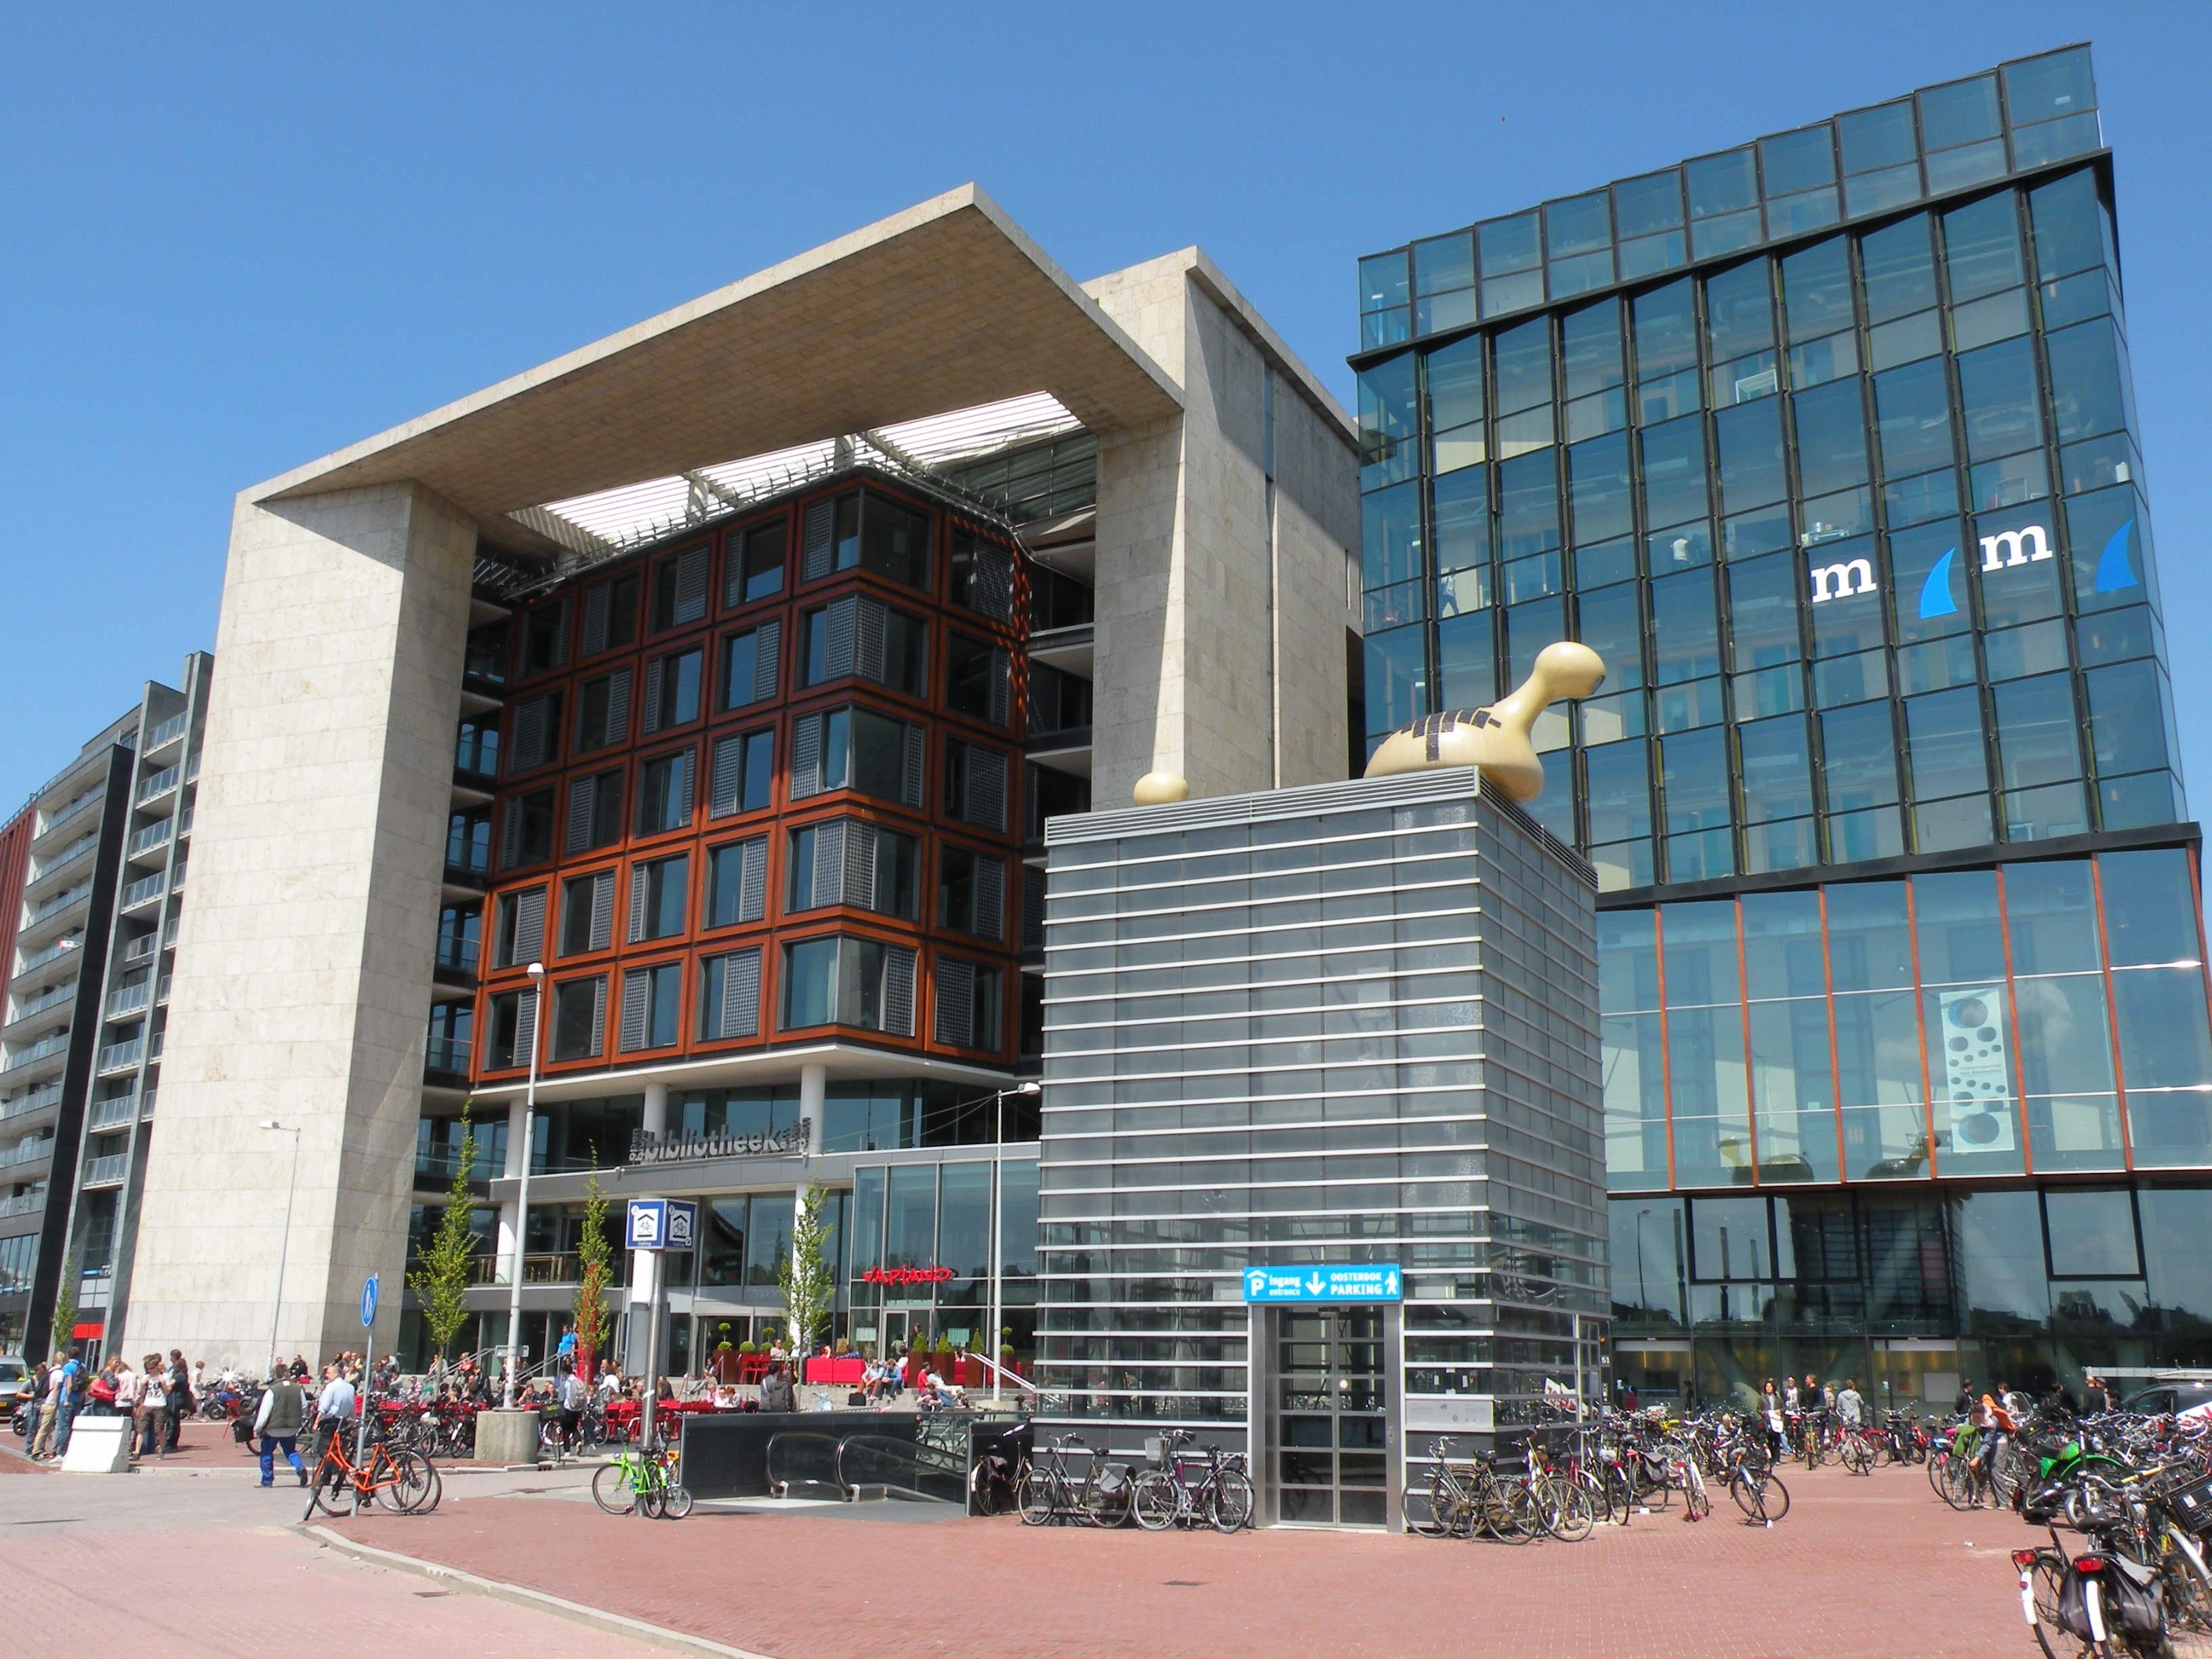 Docklands where 39 s gary - Moderne bibliotheek ...